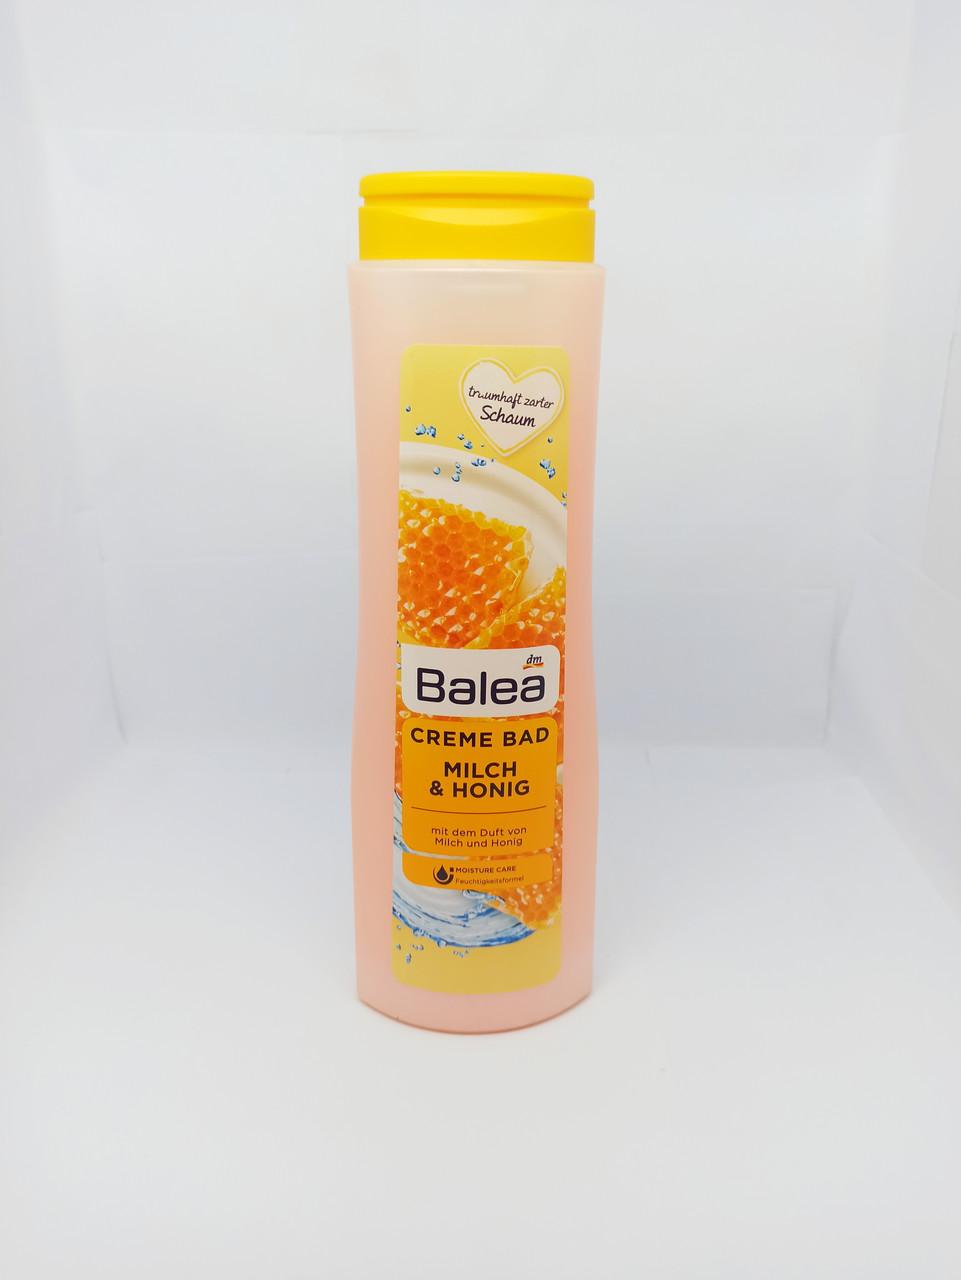 Гель для душа DM Balea Creme Bad Milch-Honig, 750 мл